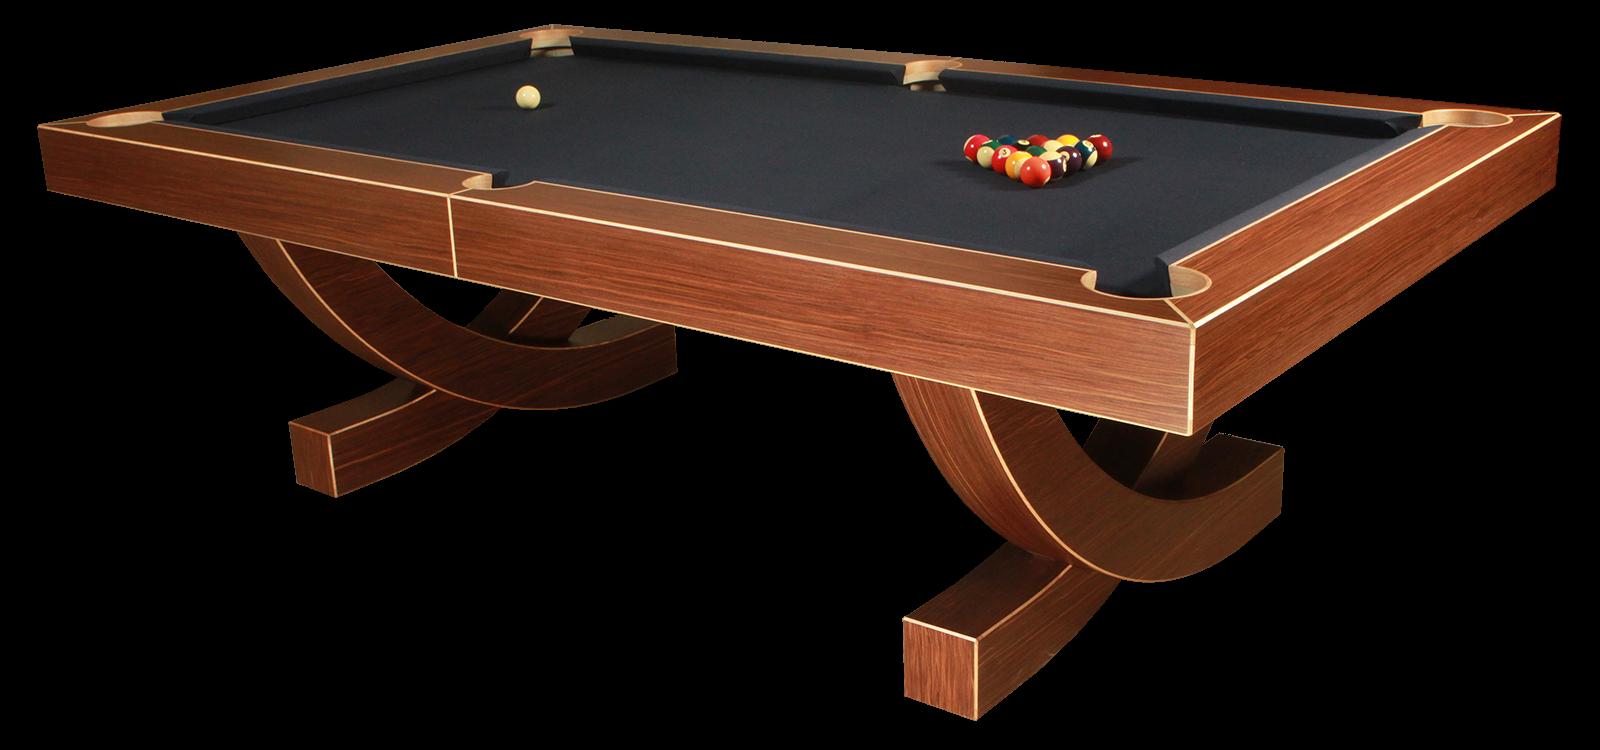 Pool Table designers manufactures in Wiltshire Designer Billiards